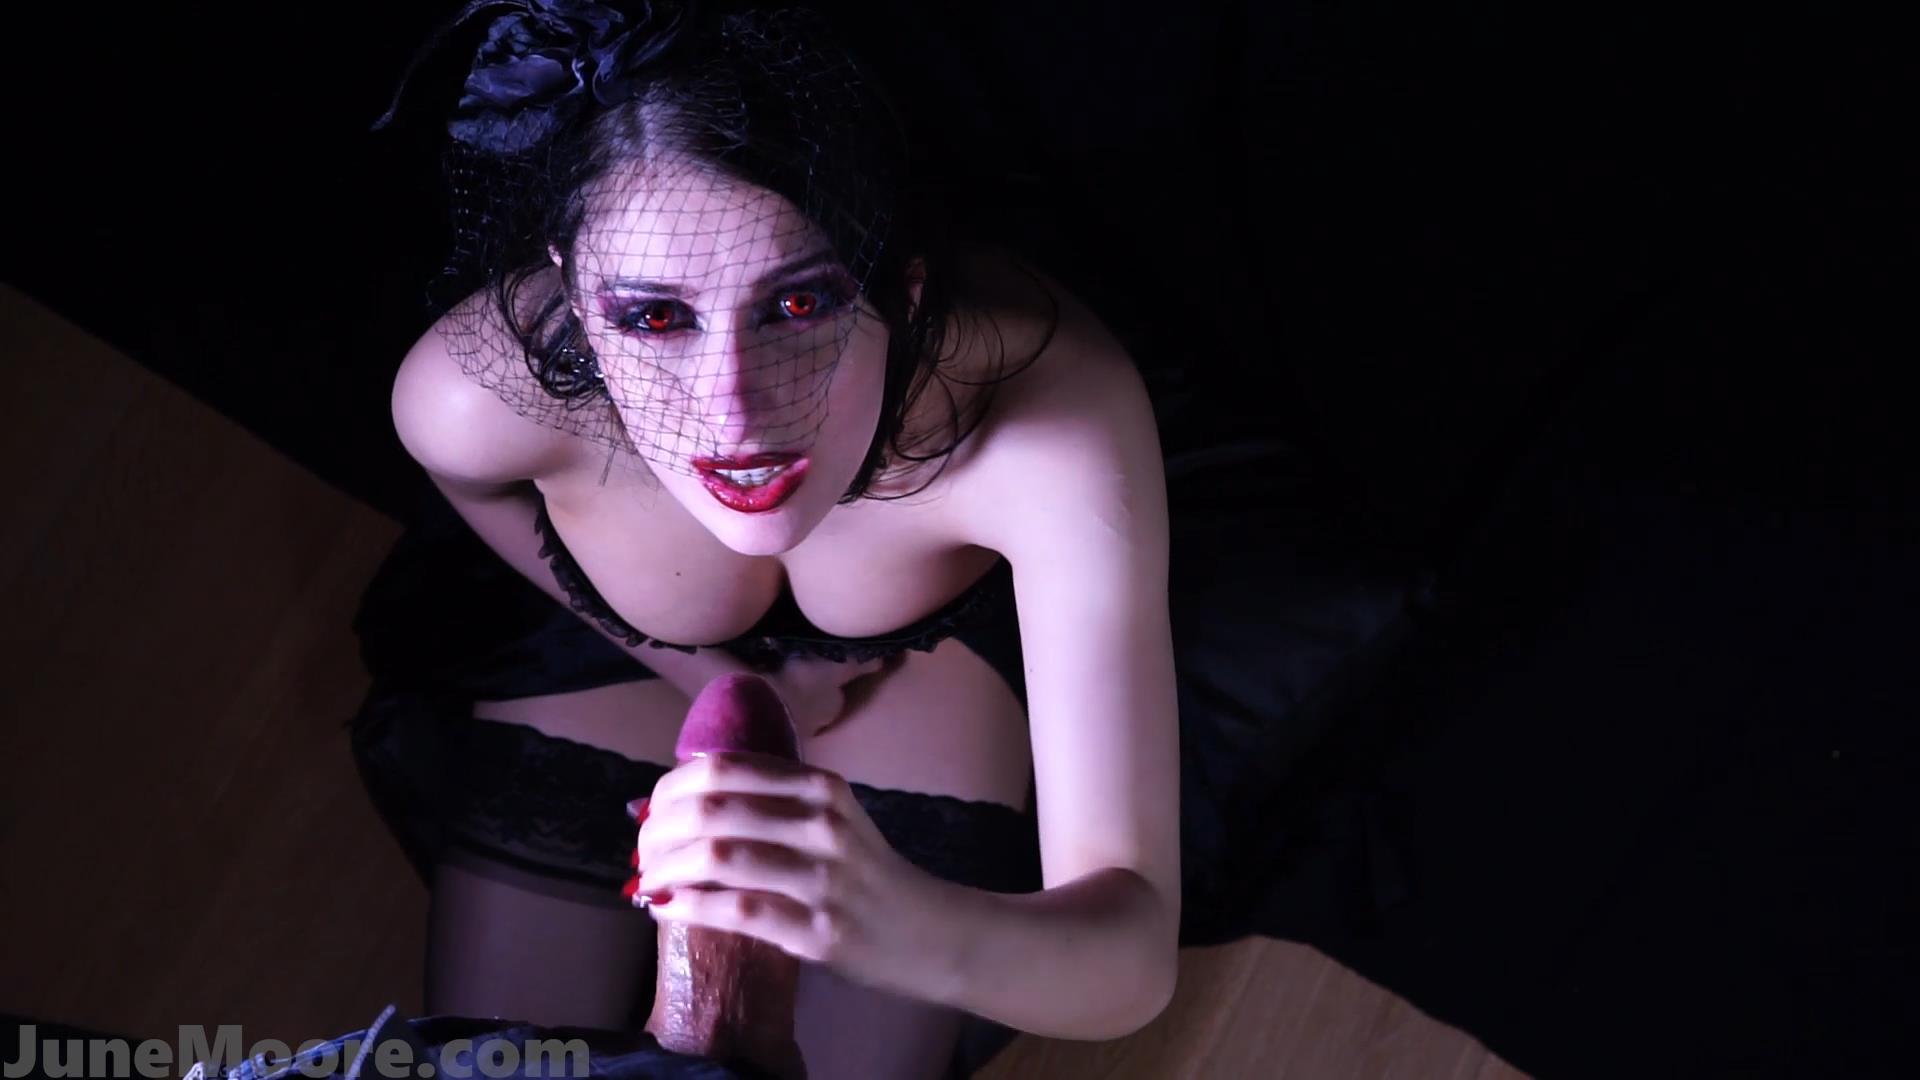 Thirst_-_b_g_Vampire_Handjob_Blowjob_-_JuneMooreXXX.jpg